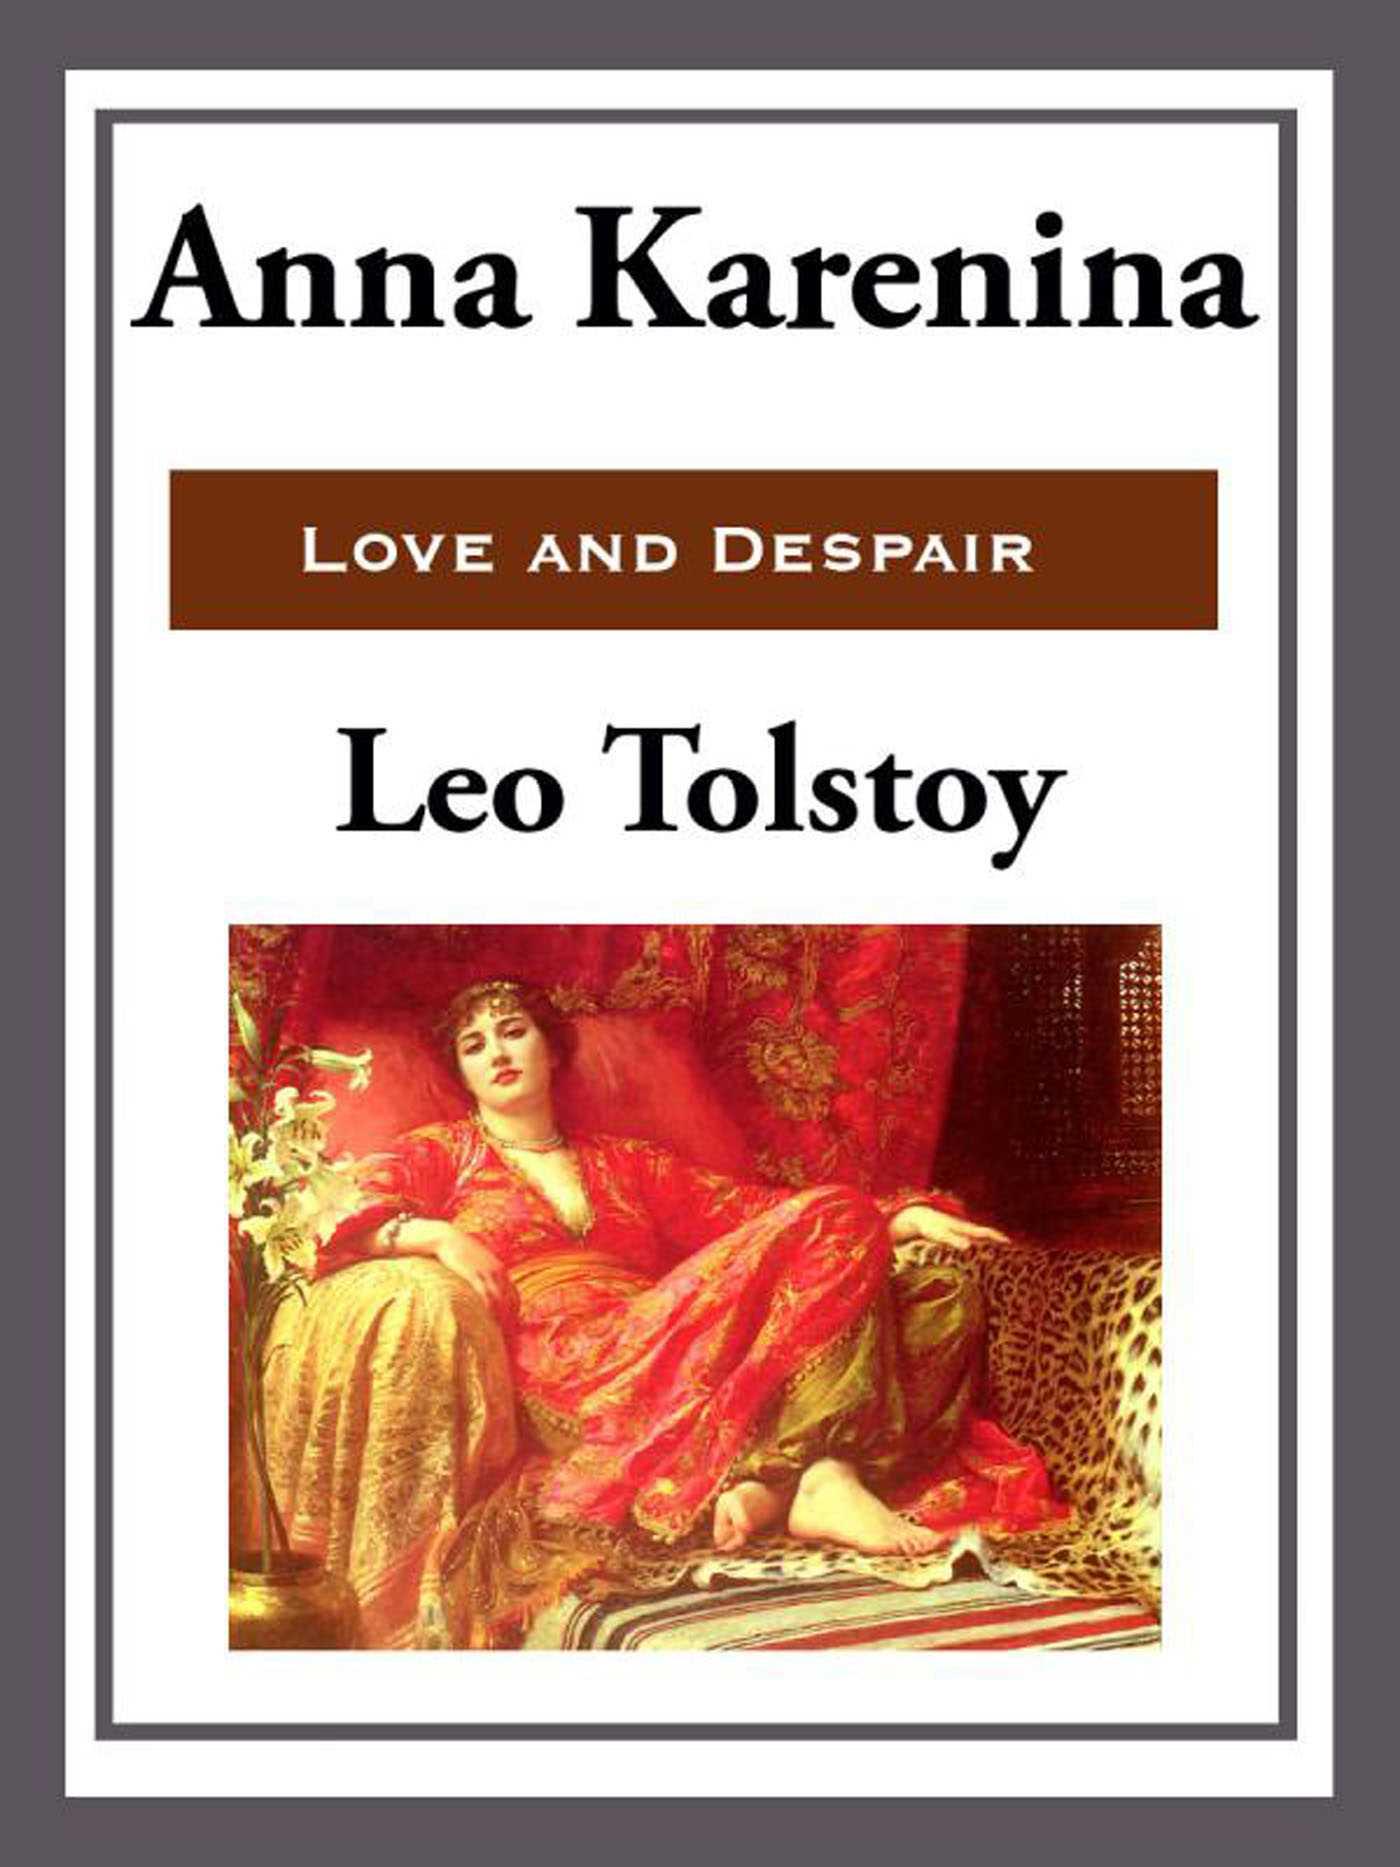 Leo Tolstoy's Anna Karenina: Foreshadowing